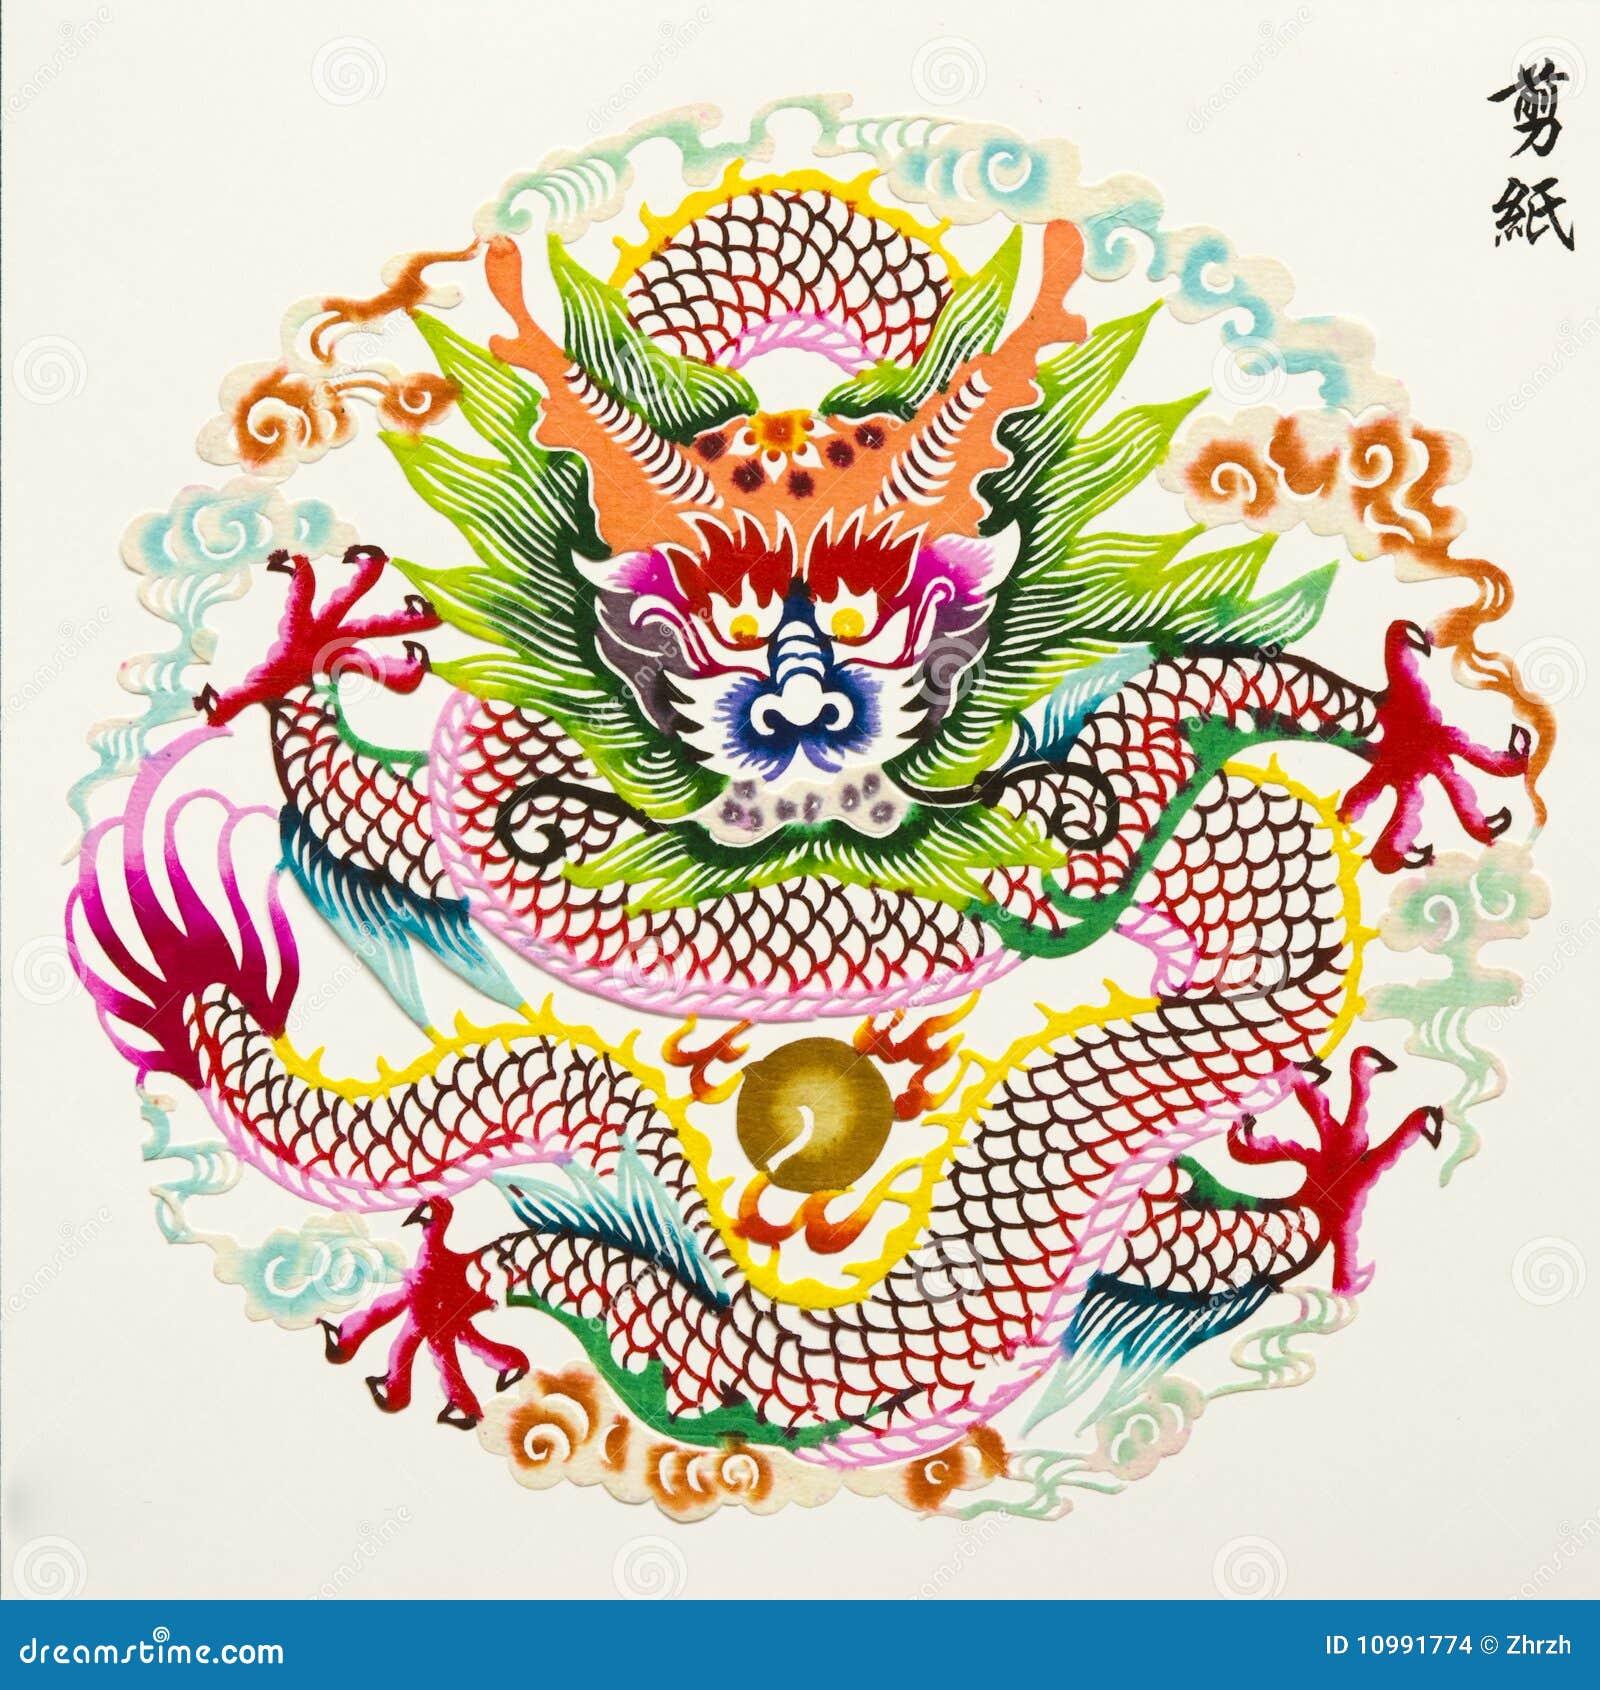 chinesisch drache farbenpapierausschnitt chinesischer tierkreis stockbilder bild 10991774. Black Bedroom Furniture Sets. Home Design Ideas